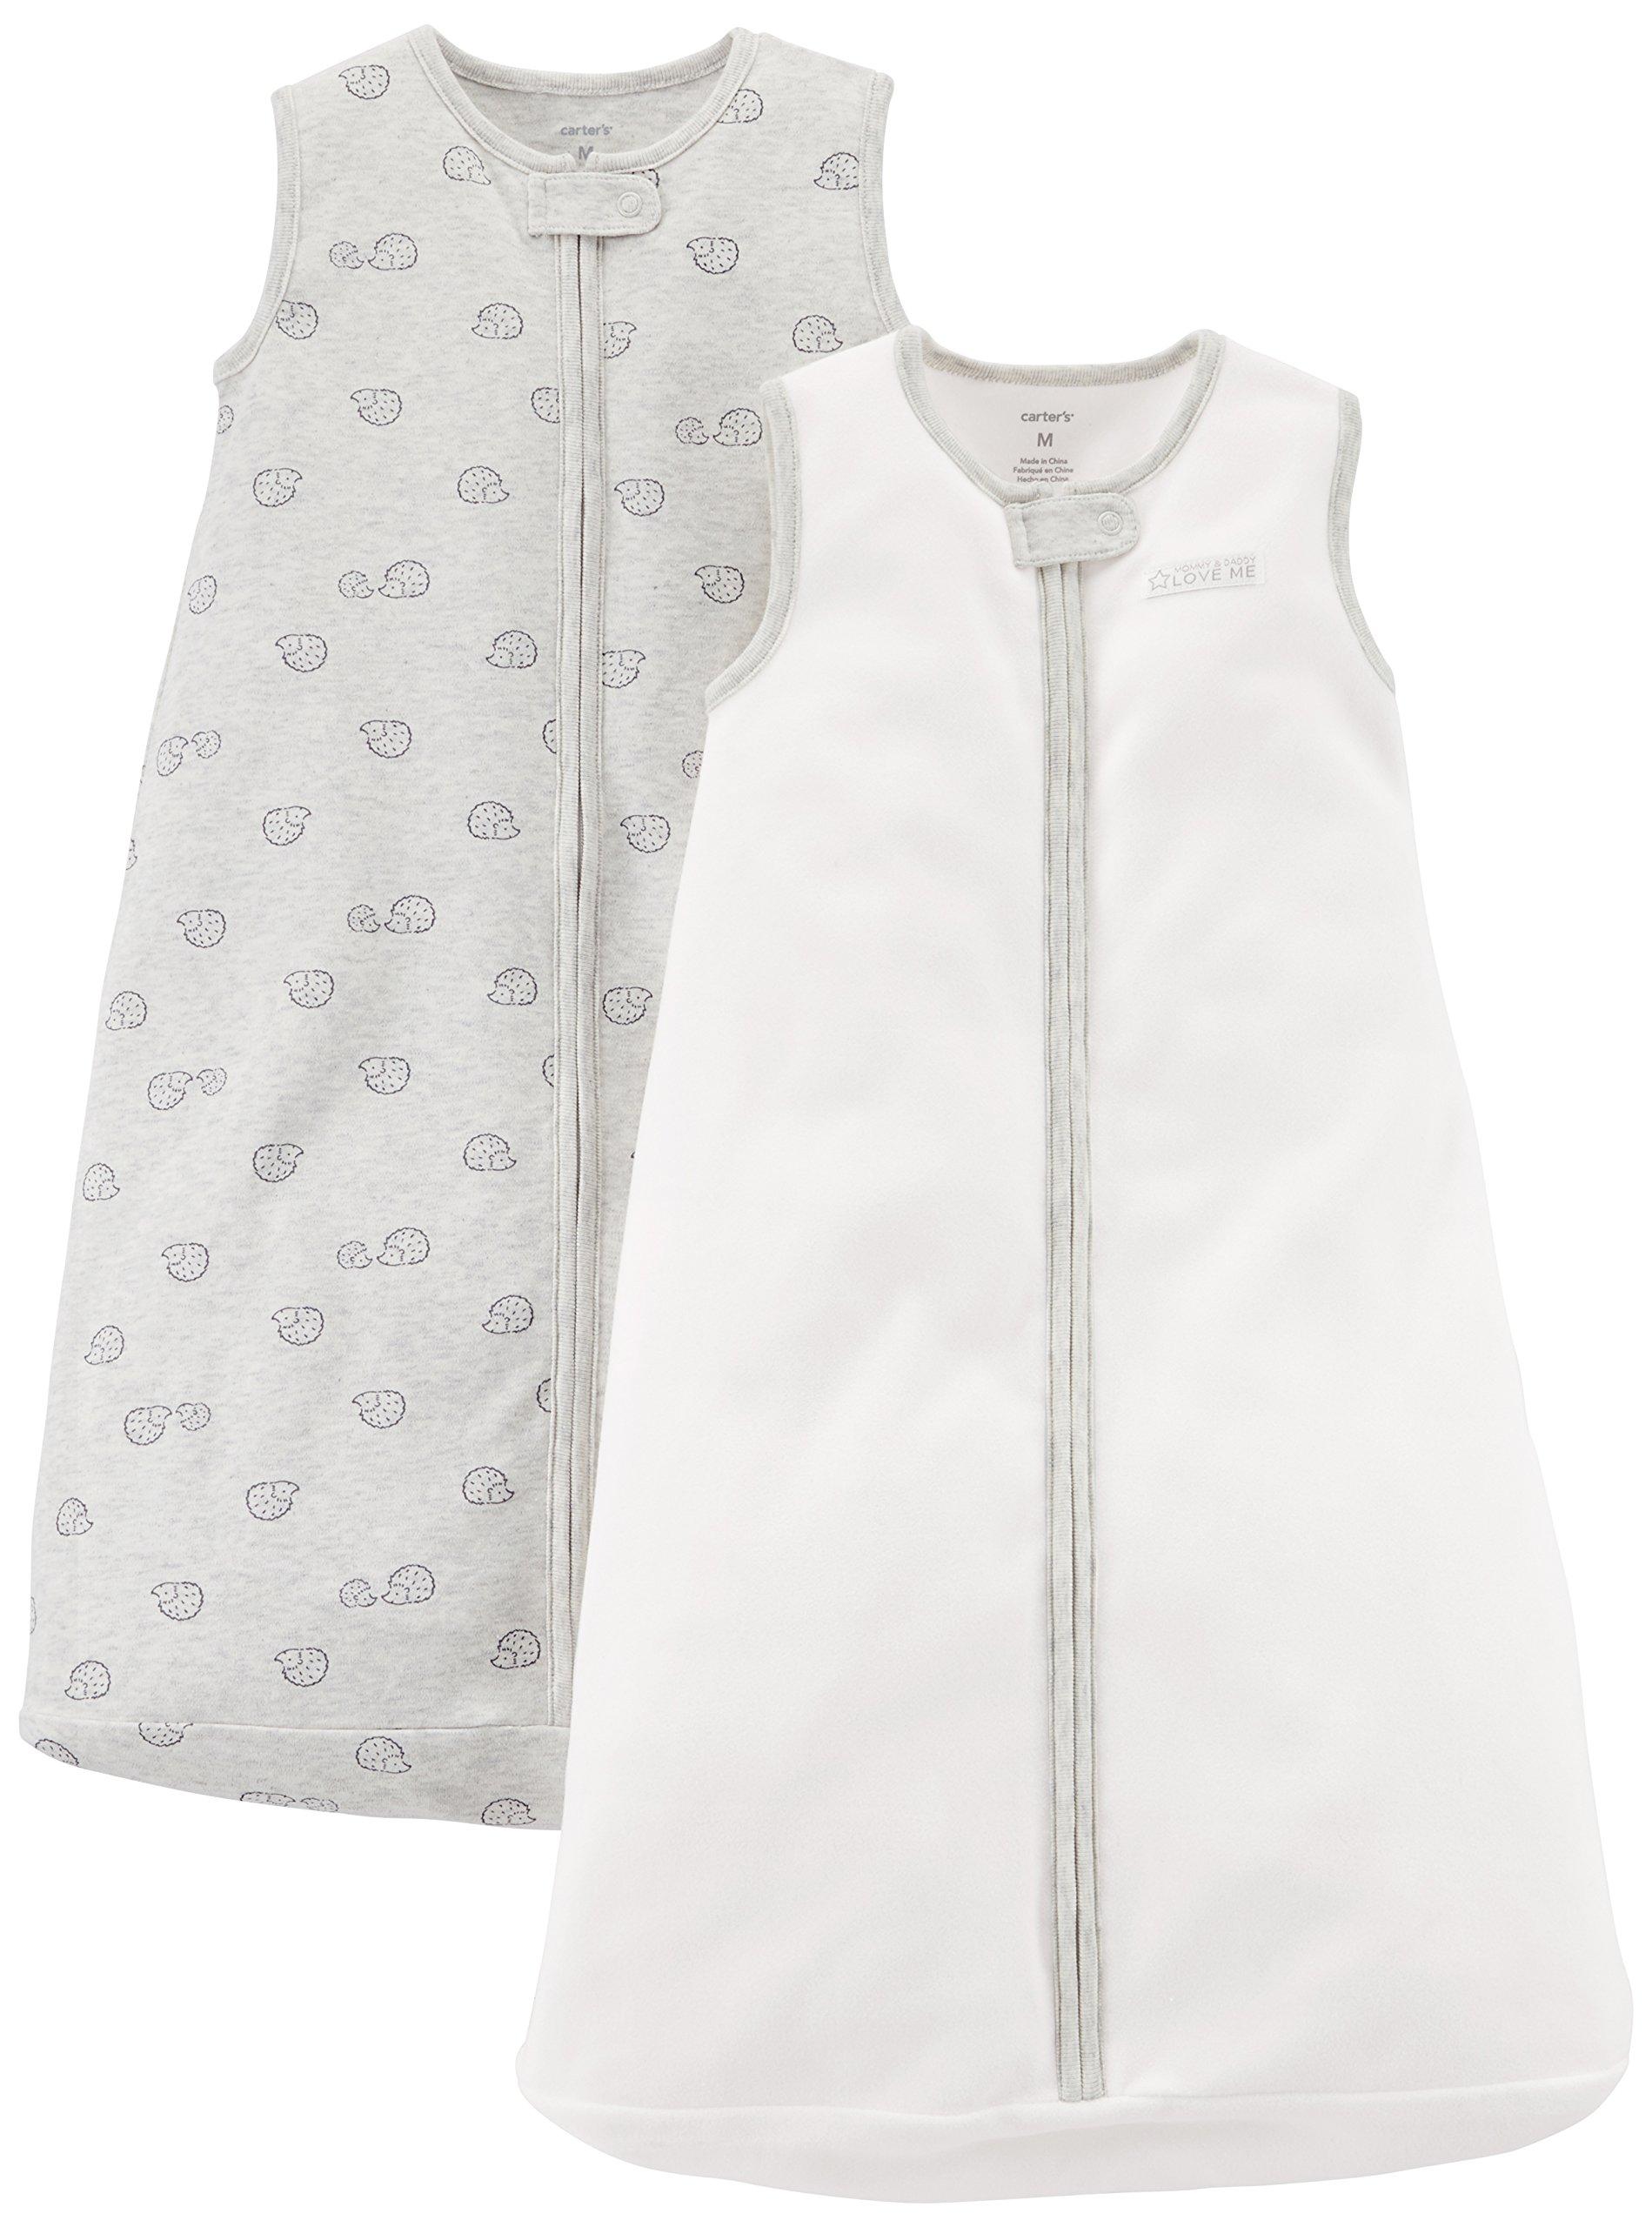 Carter's Baby 2-Pack Cotton Sleepbag, Ivory/Grey Hedgehog, Medium